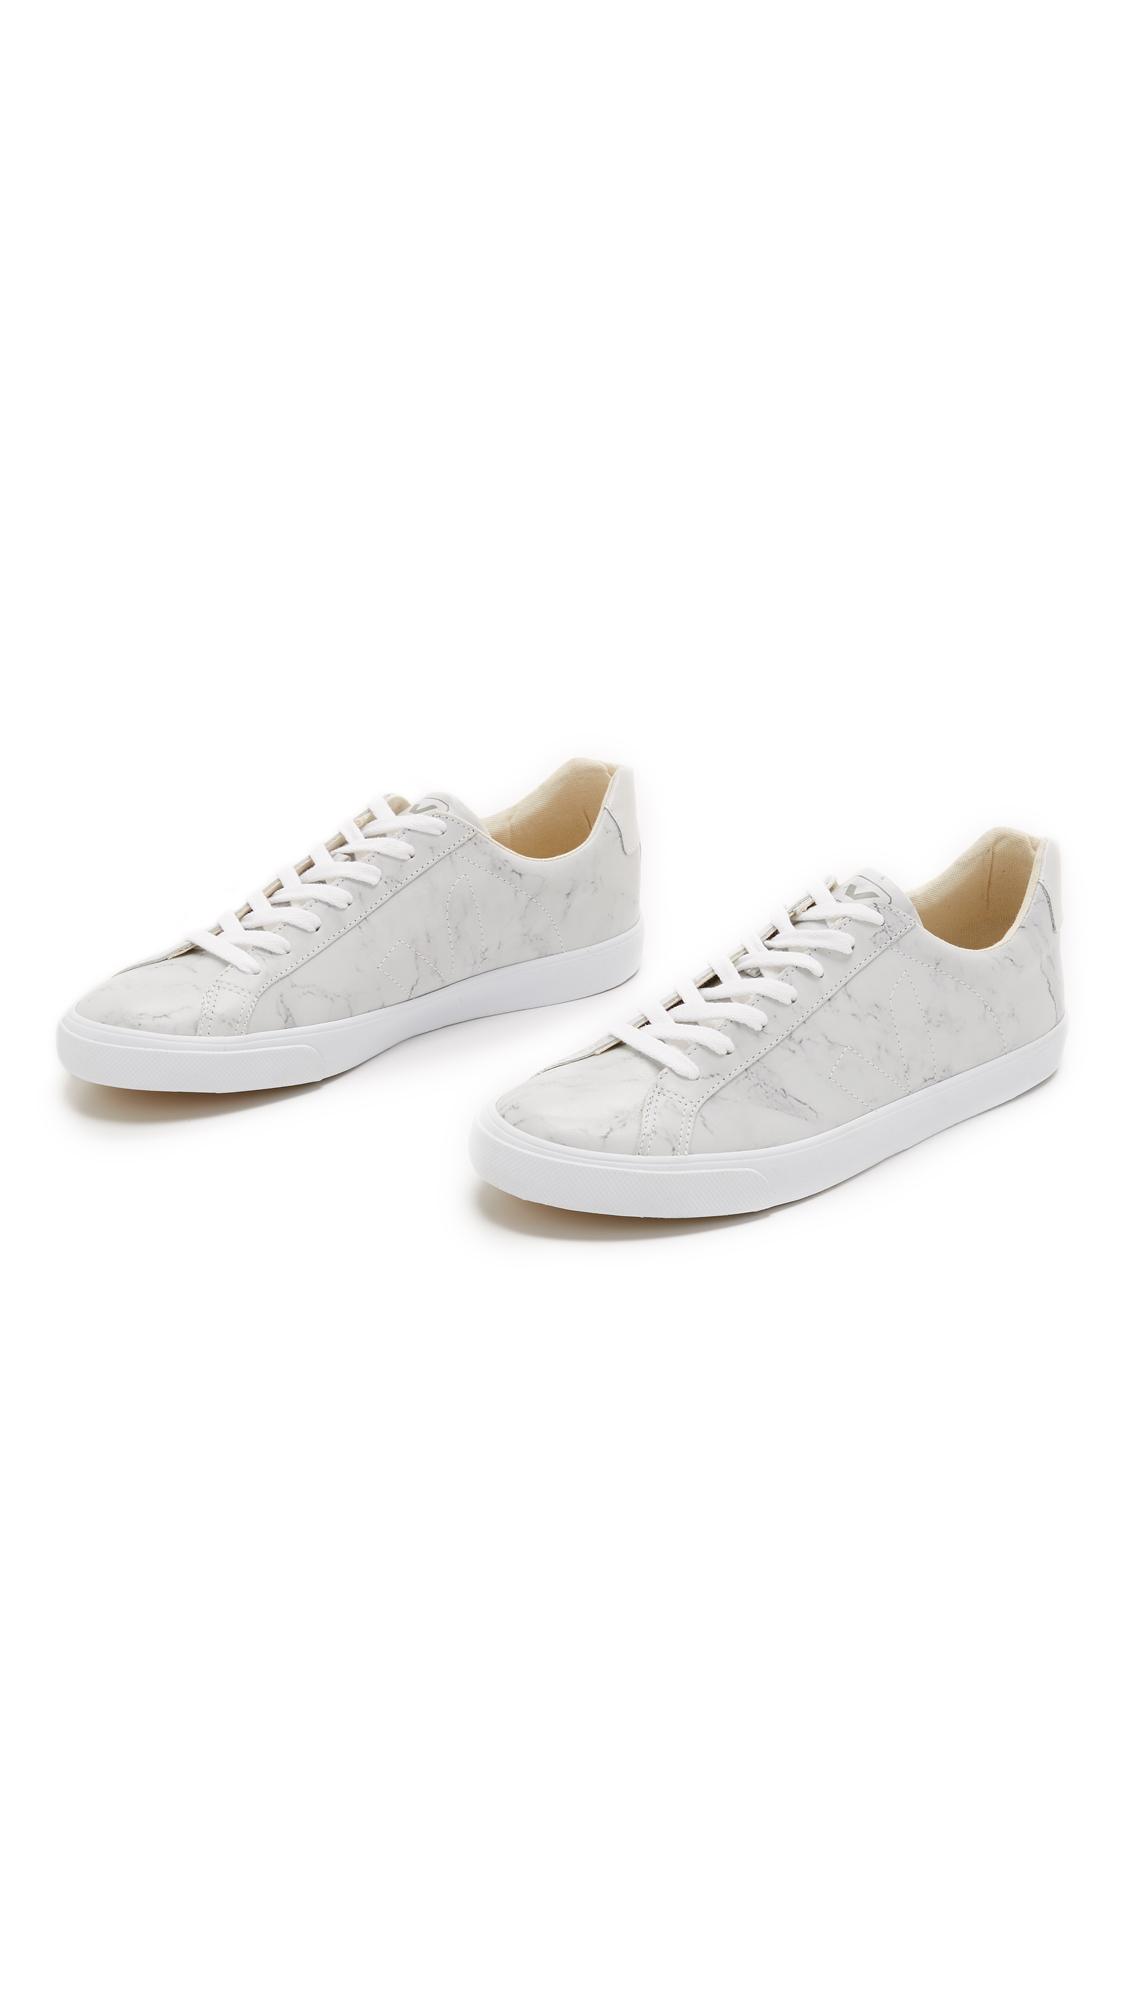 Lyst Veja Esplar Leather Sneakers In Gray For Men